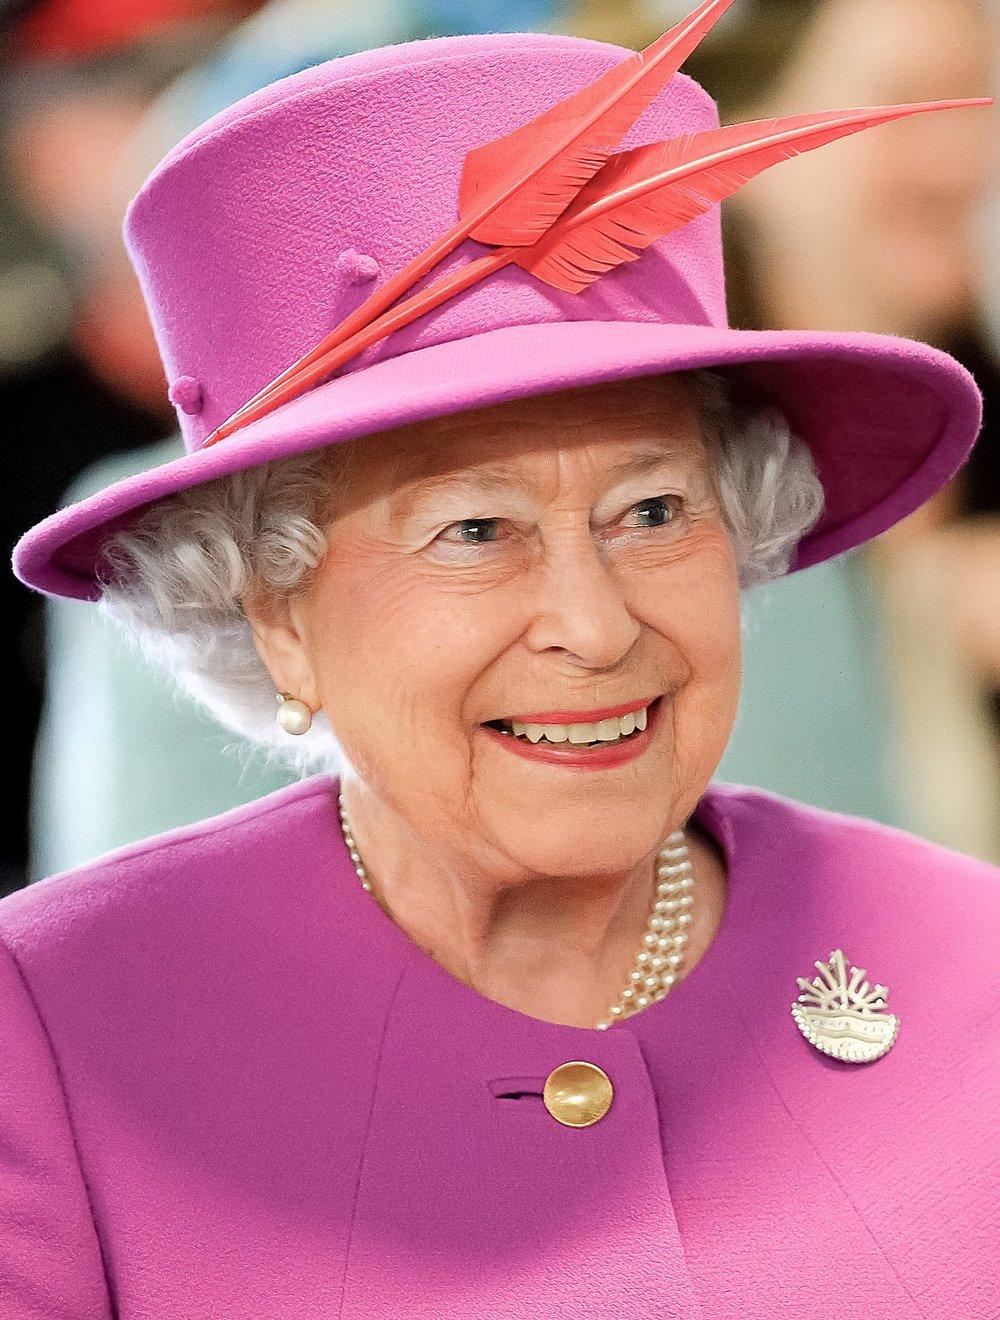 1200px-Queen_Elizabeth_II_in_March_2015.jpg